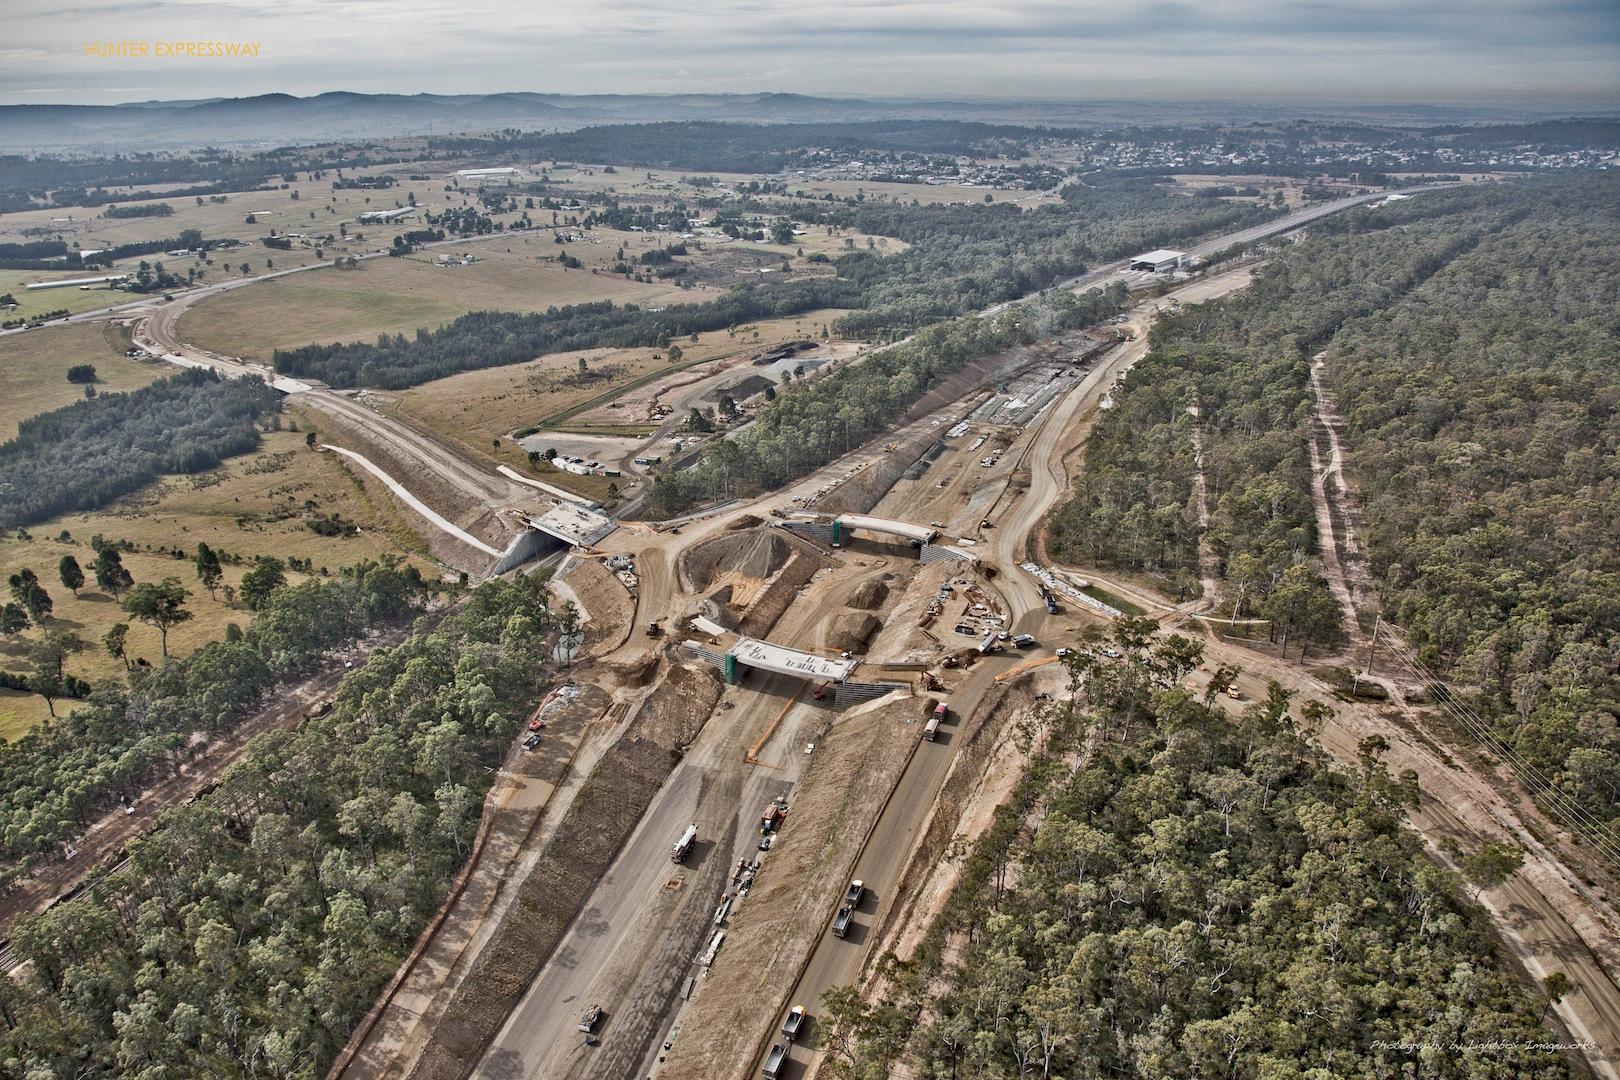 Hunter Expressway Freeway Constrcution